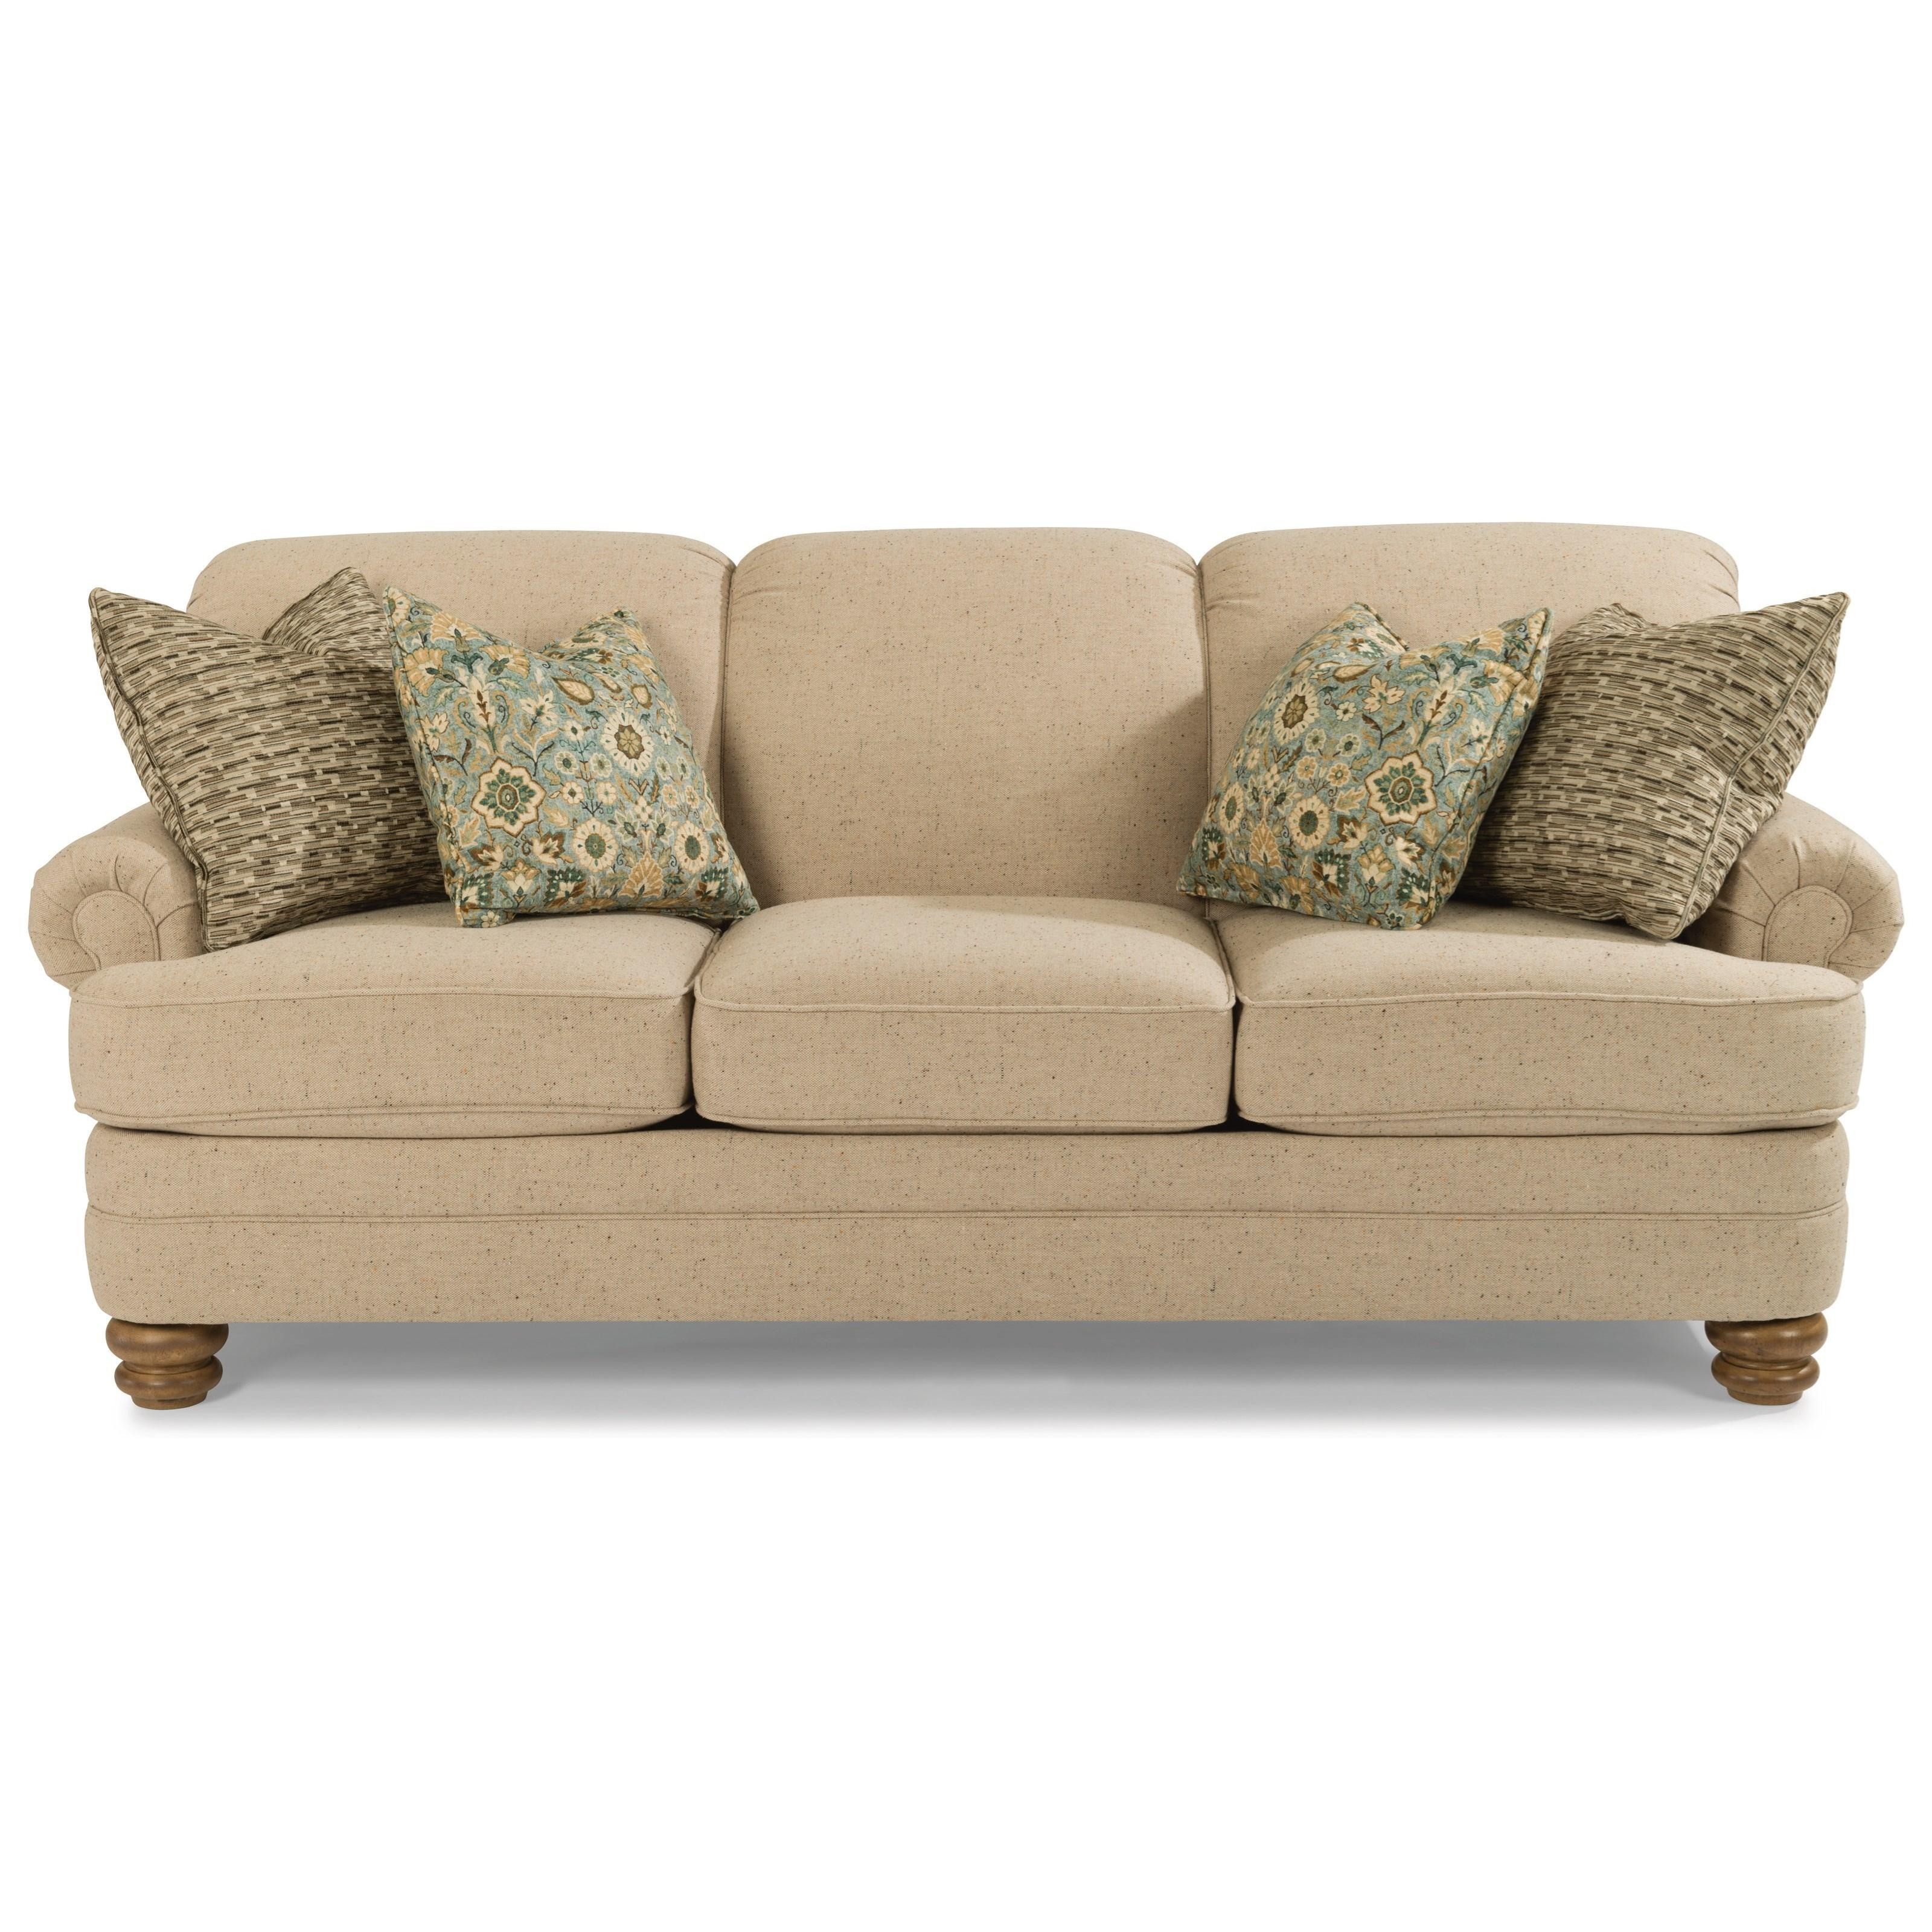 Flexsteel Bay Bridge Traditional Rolled Back Sofa | Turk Furniture